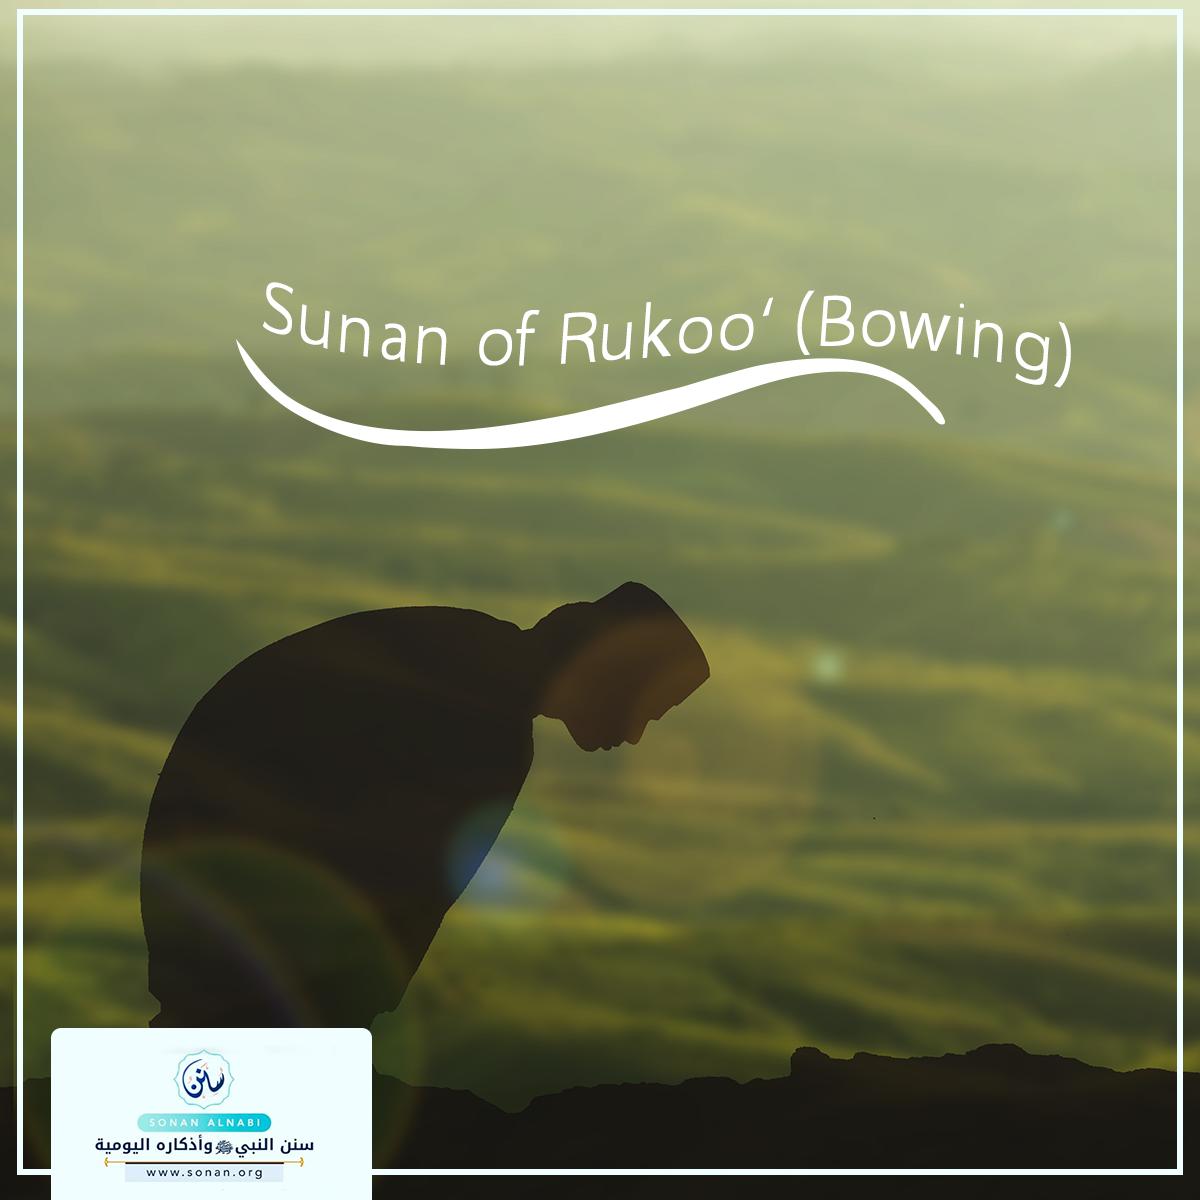 Sunan of Rukoo' (Bowing)